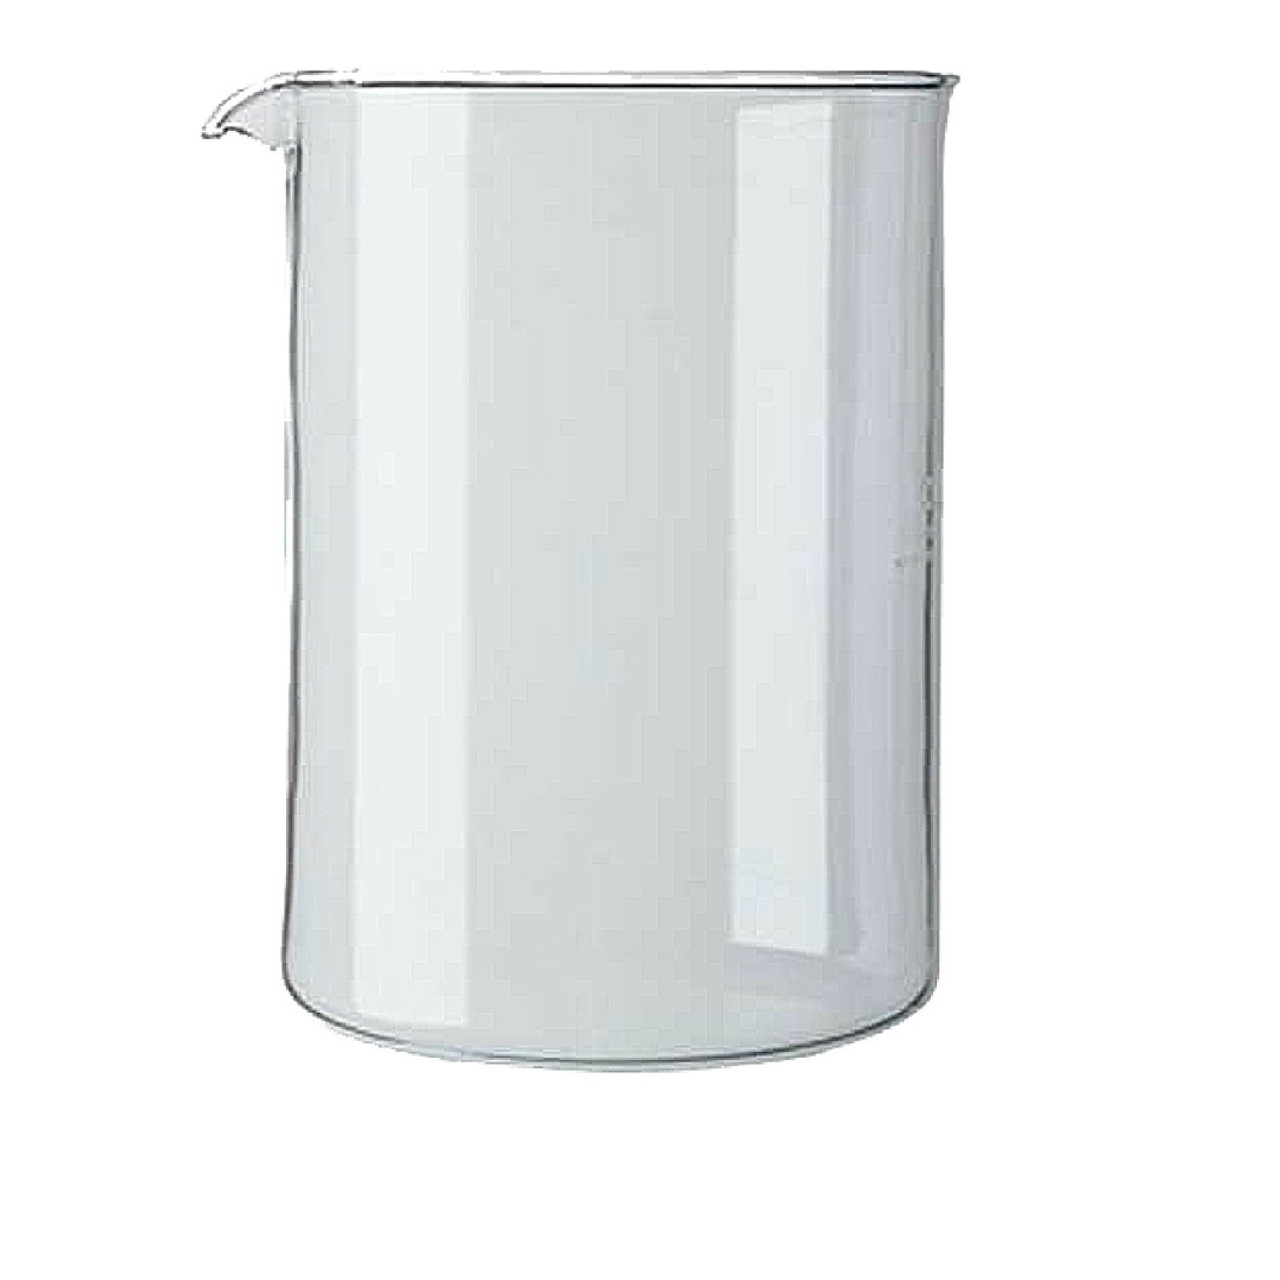 Bodum Chambord Glass Beaker, 4 Cup